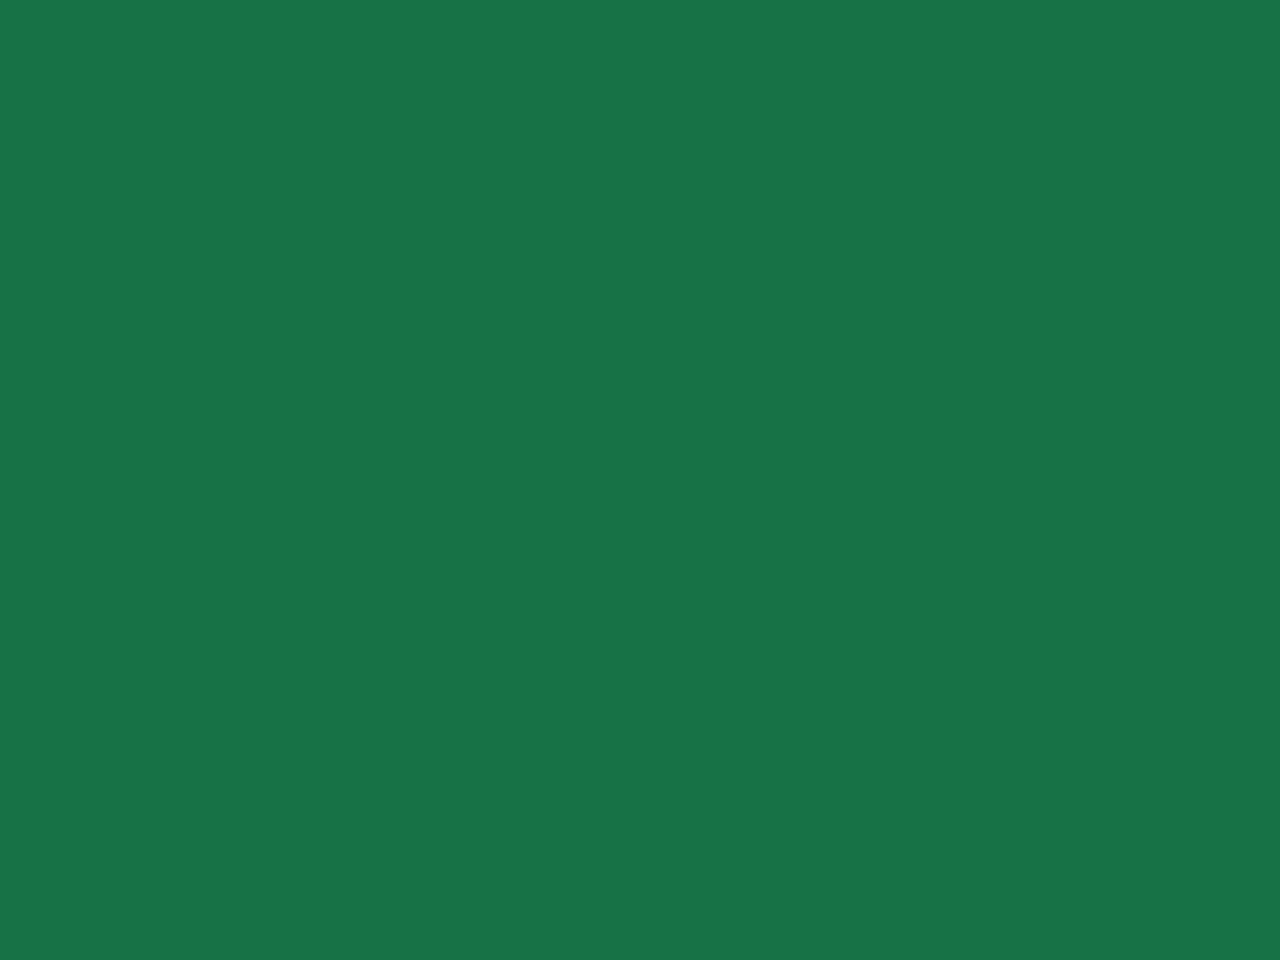 1280x960 Dark Spring Green Solid Color Background